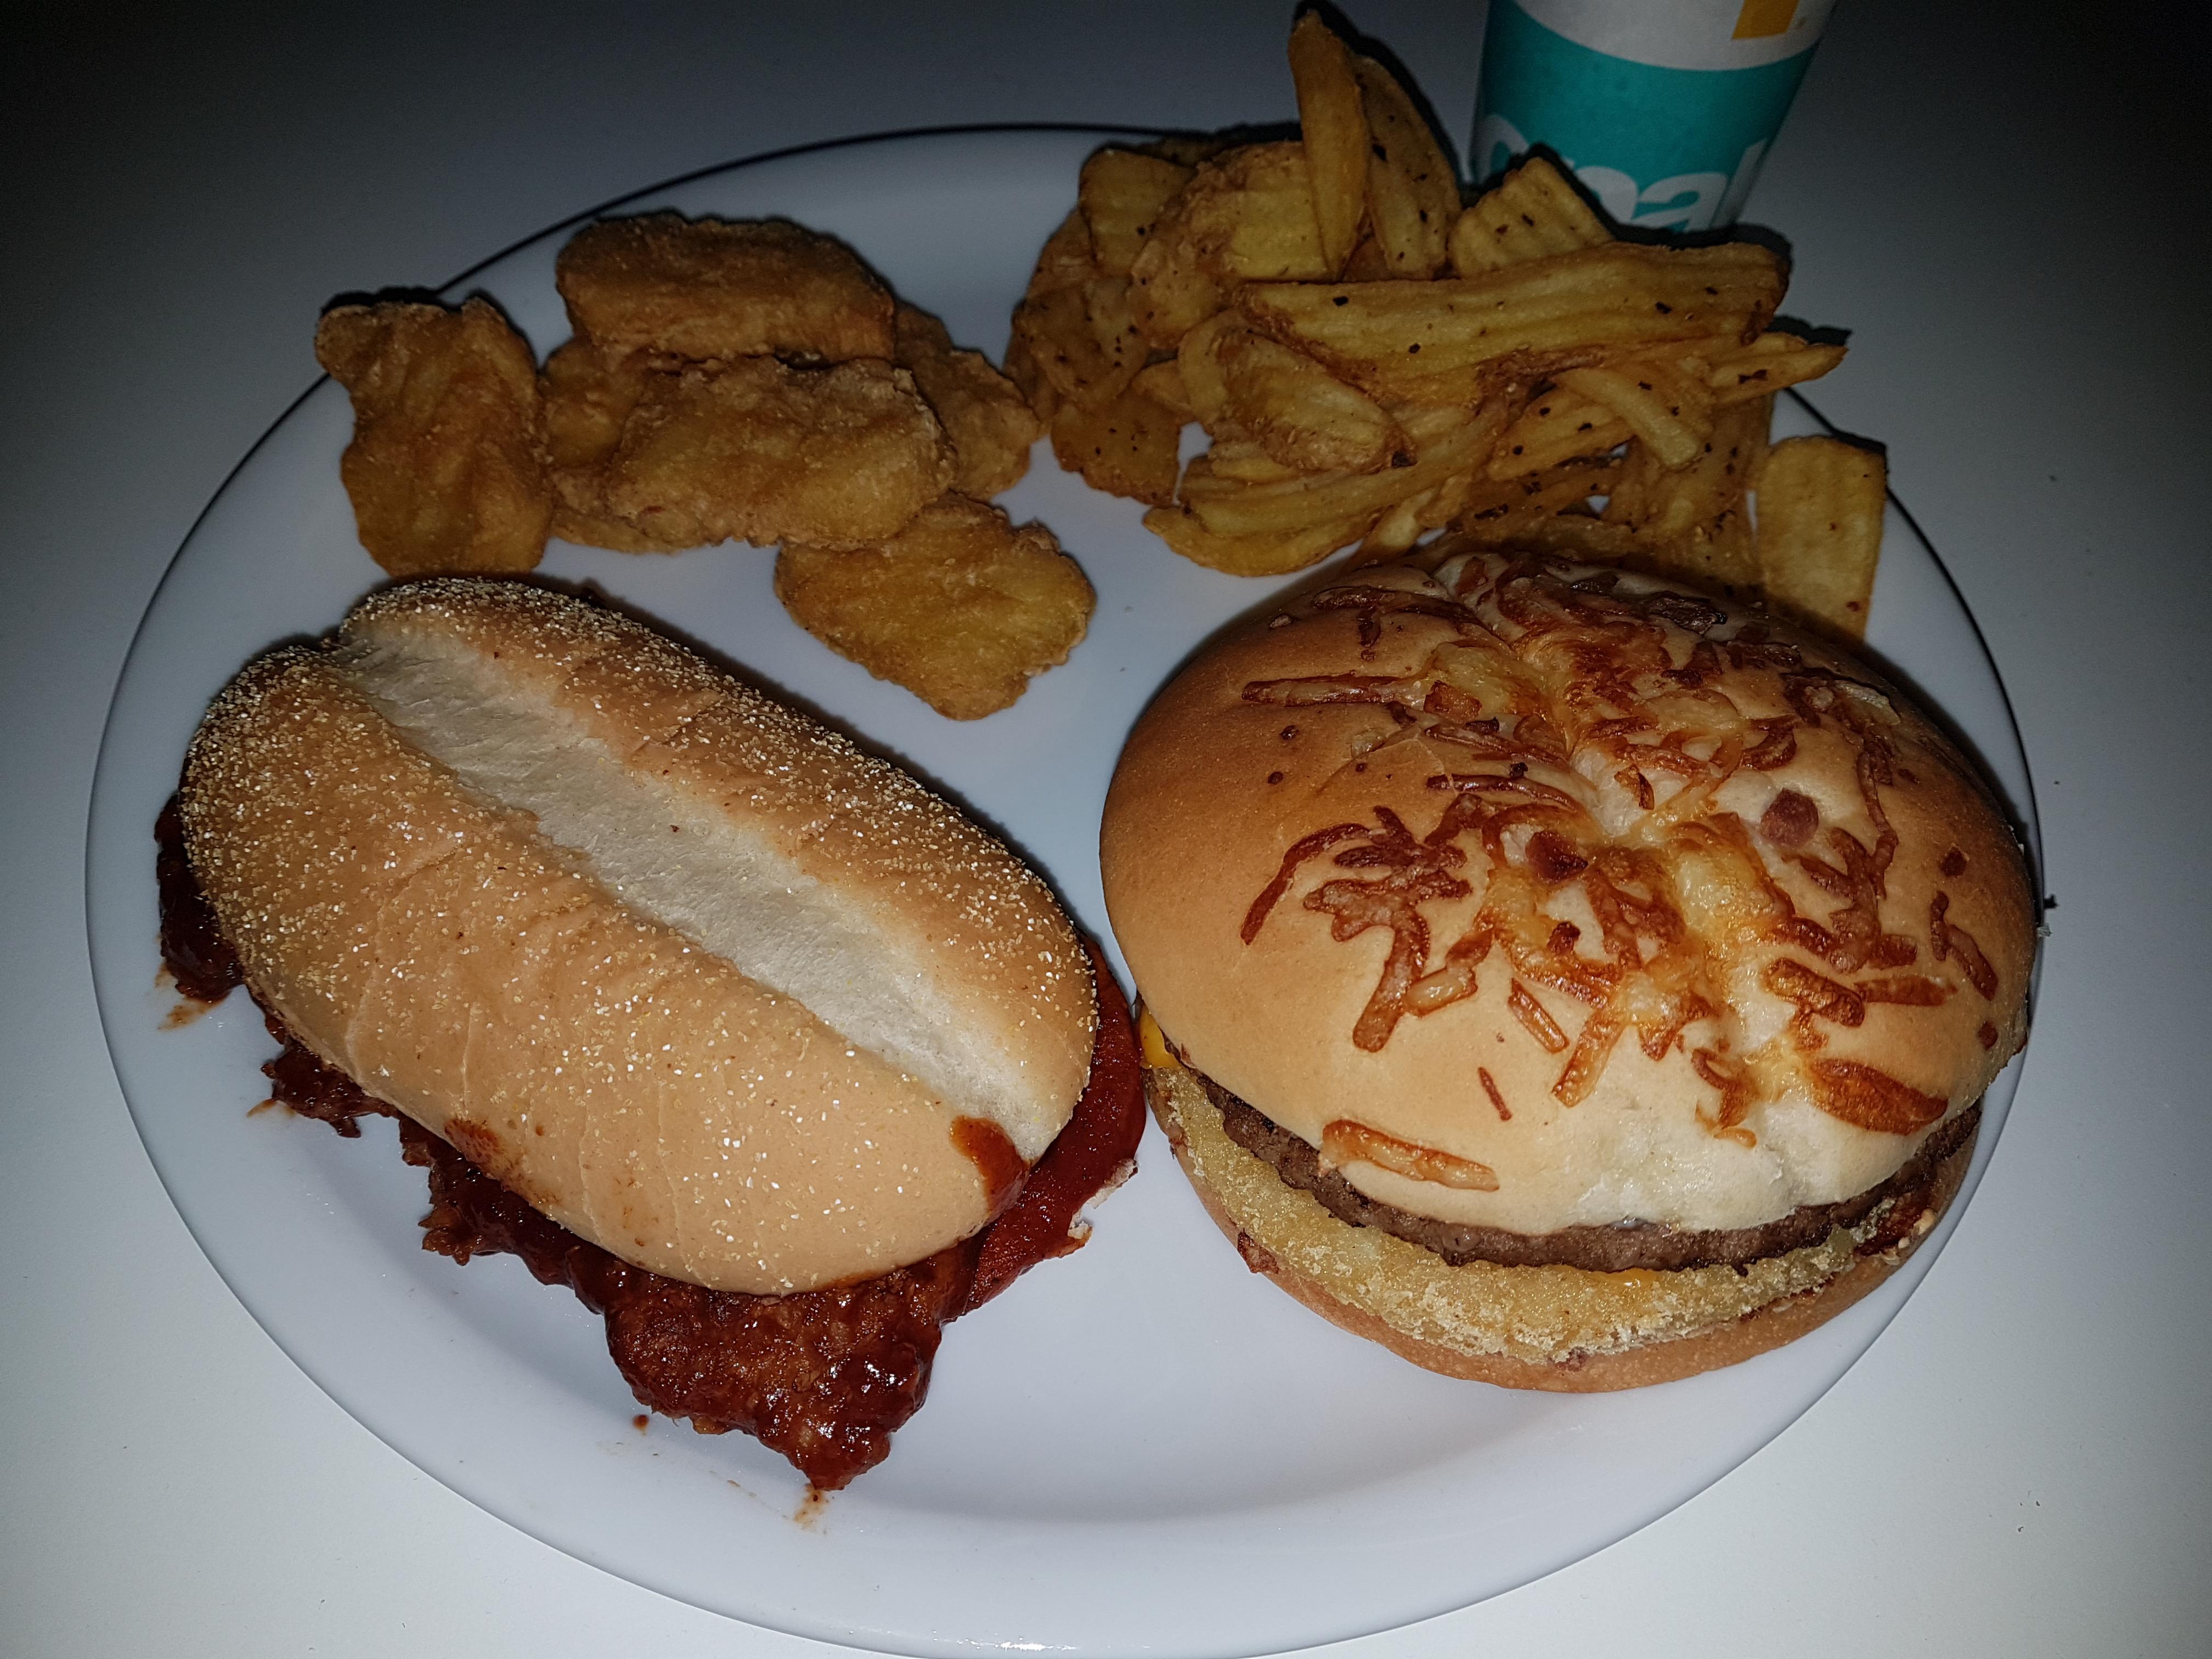 https://foodloader.net/Holz_2020-01-17_McDonalds.jpg